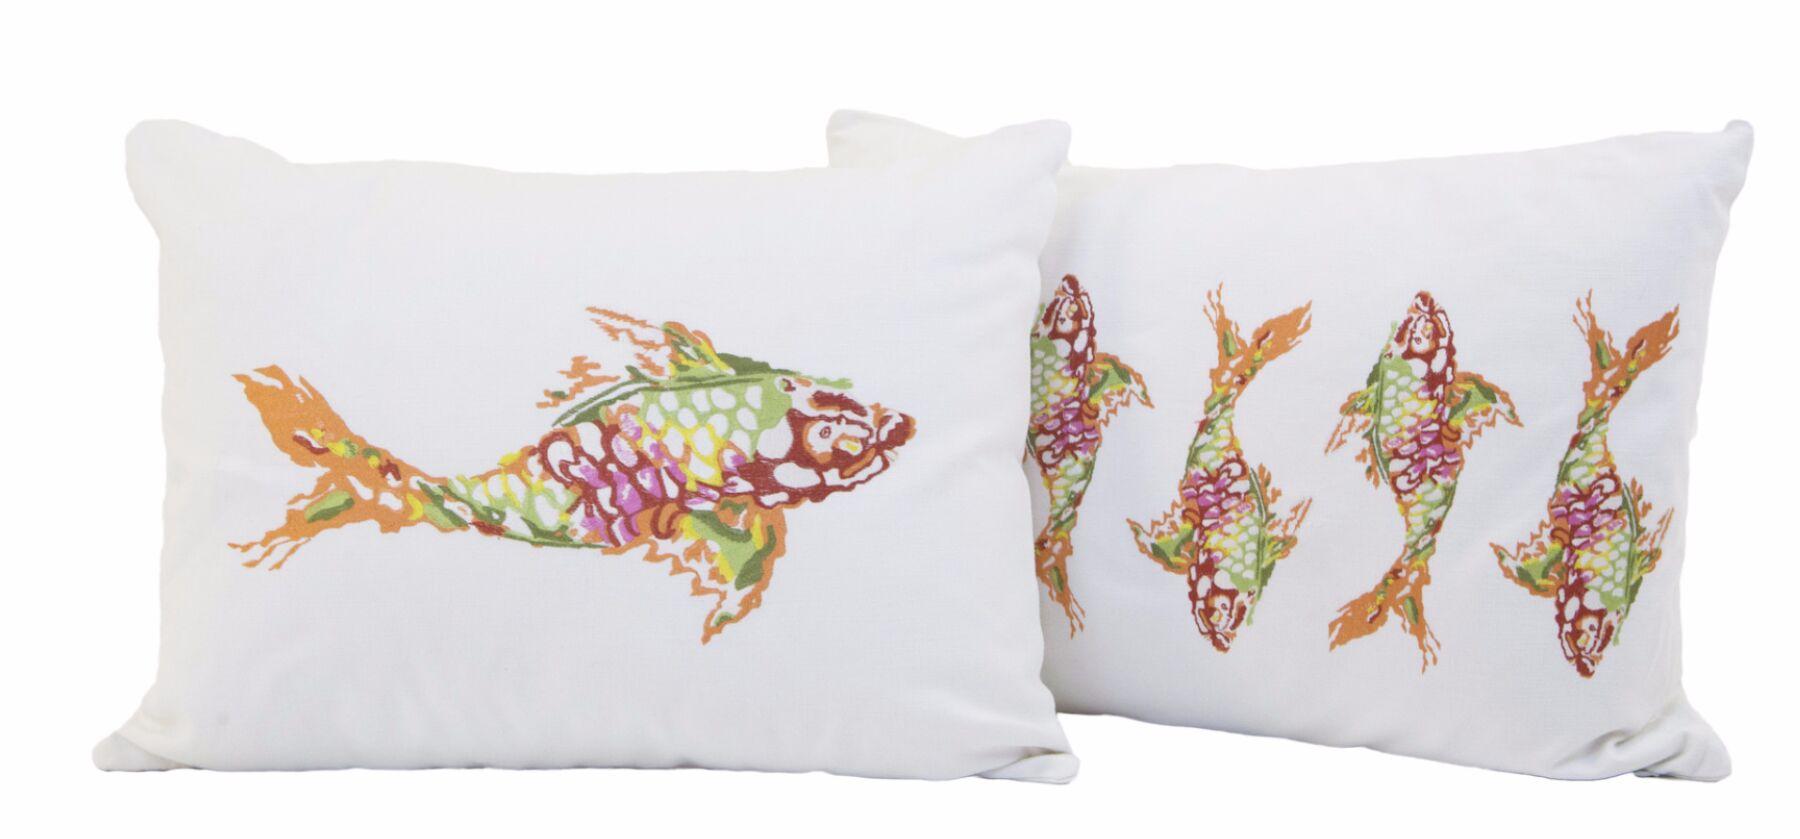 Glines Koi Fish Cotton Lumbar Pillow Color: Orange/Red